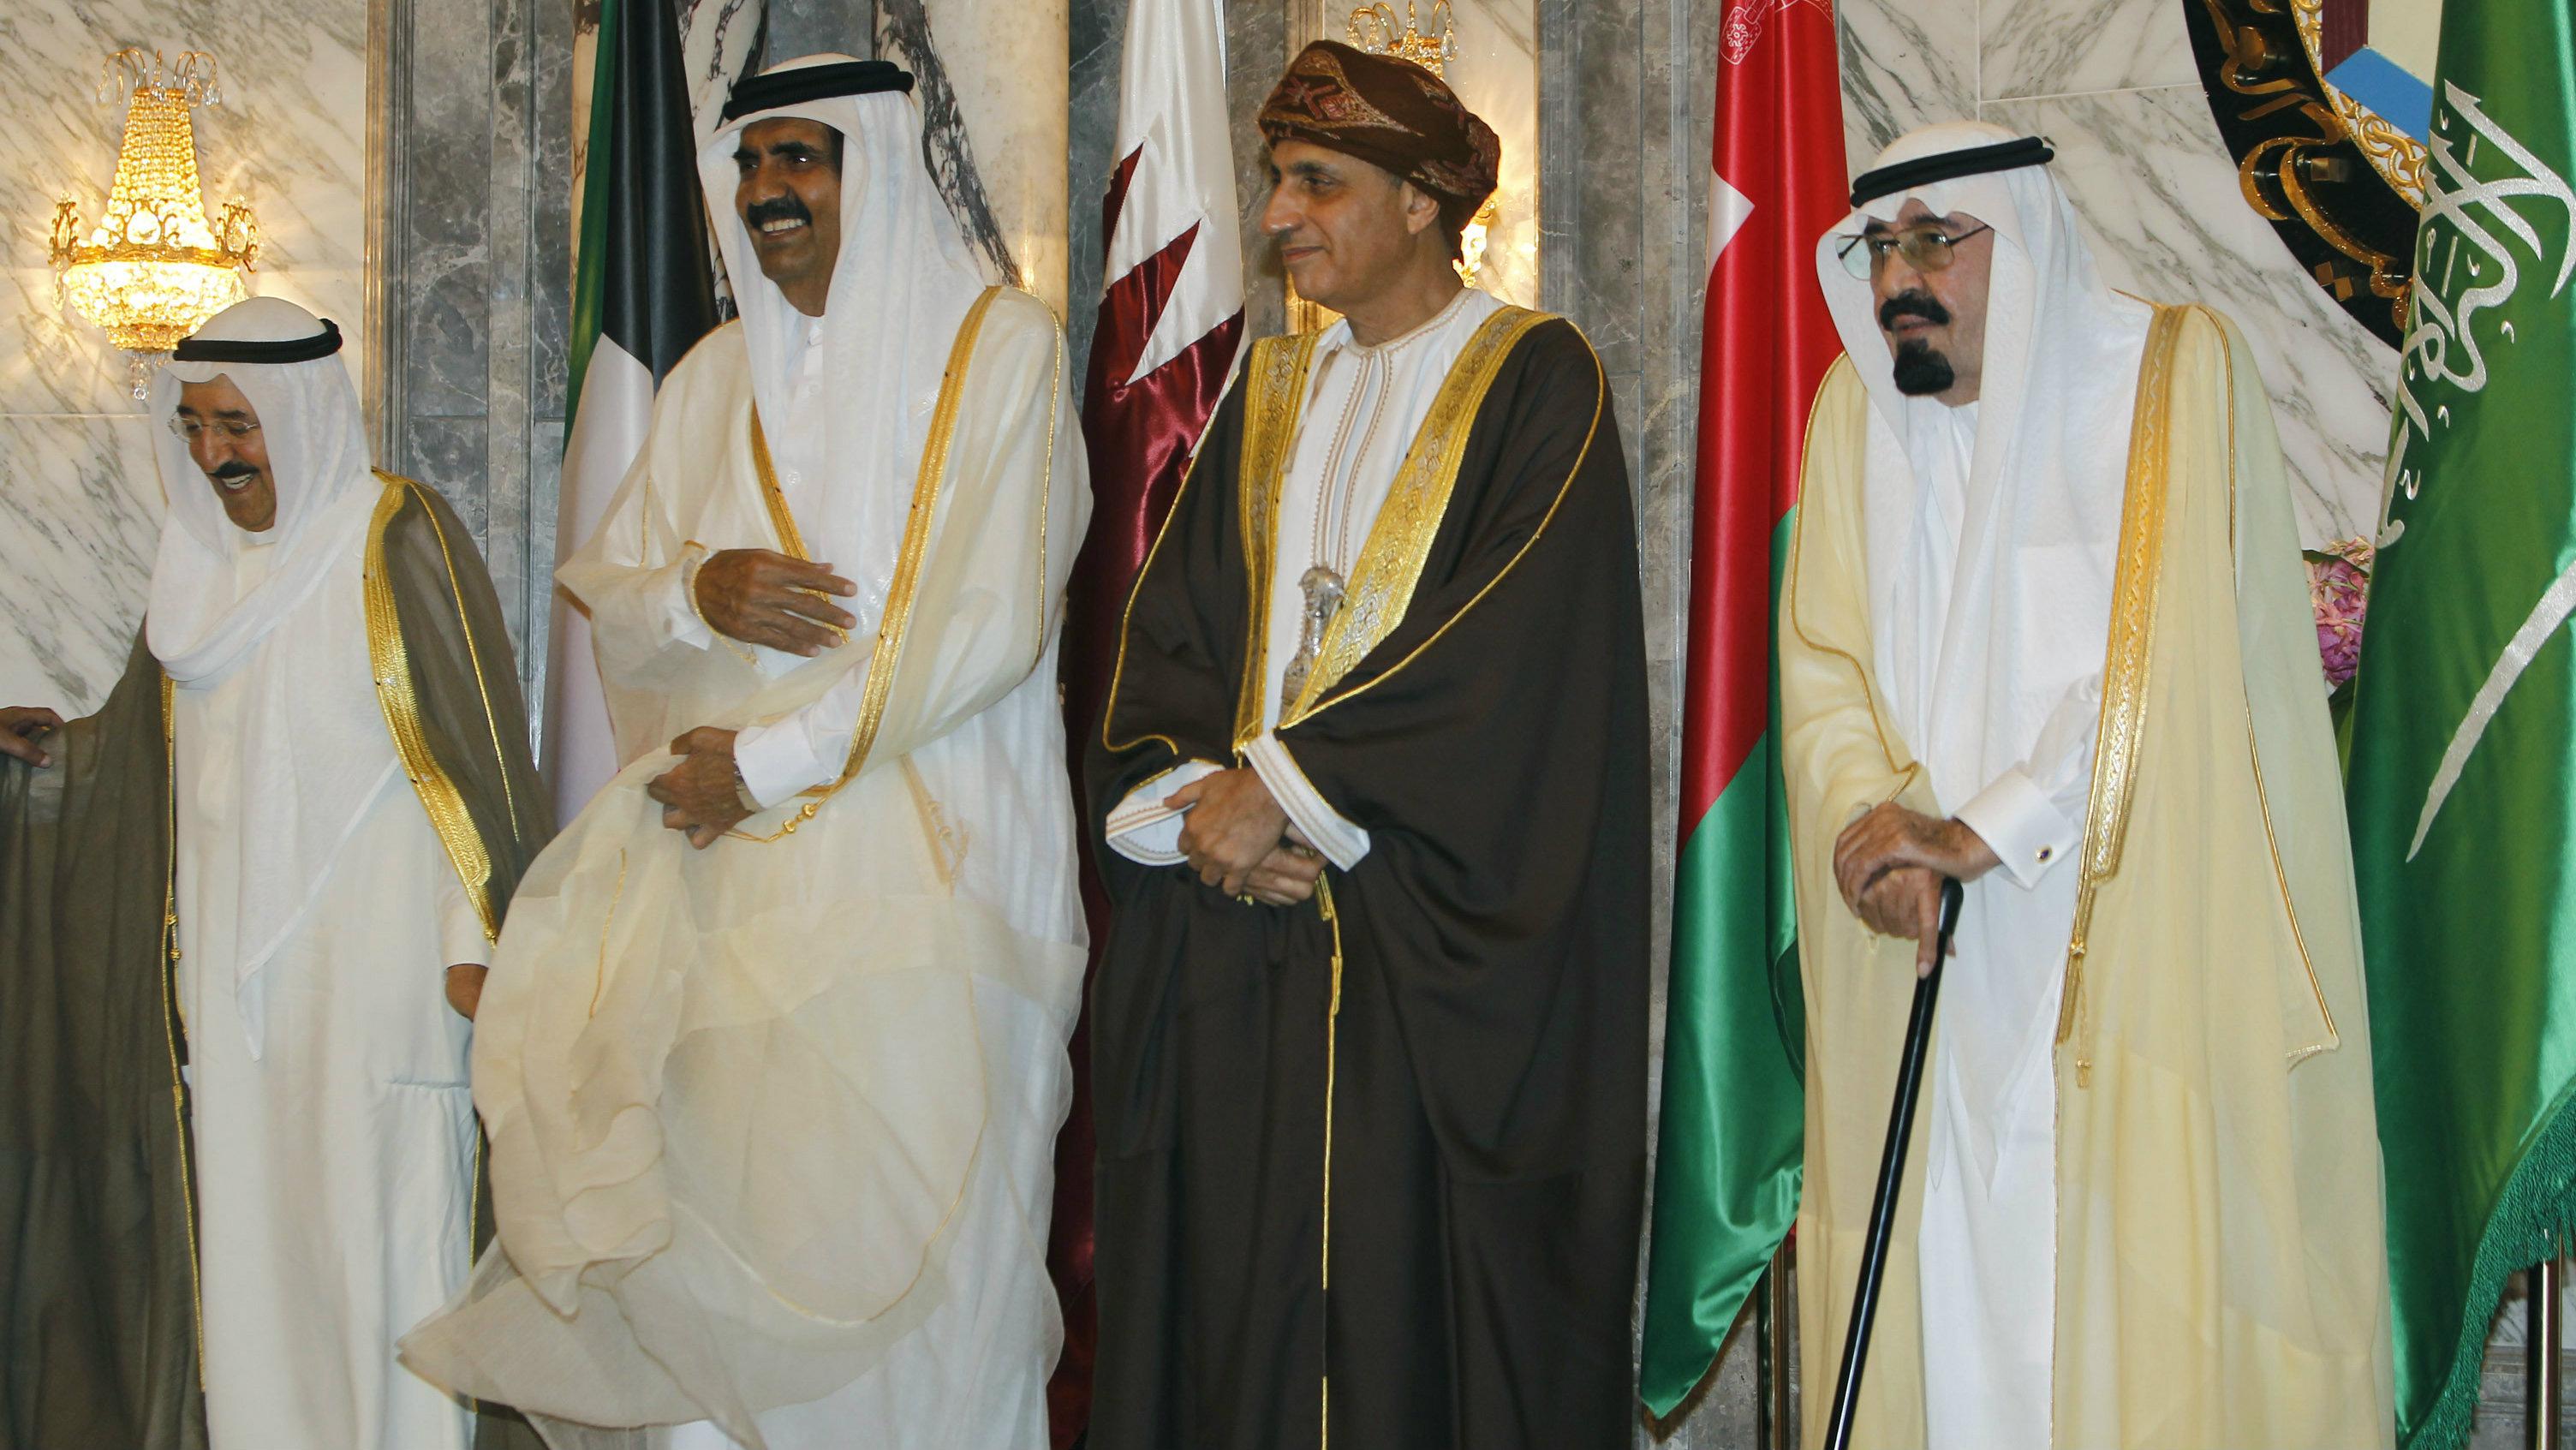 Saudi Arabia's King Abdullah, (R) Omani Deputy Prime Minister for the Council of Ministers Sayyid Fahd bin Mahmoud al-Said, (2nd R) Qatar's Emir Sheikh Hamad bin Khalifa al-Thani (2nd L) and Kuwaiti Emir Sheikh Sabah al-Ahmad al-Sabah pose for a picture before their meeting in Riyadh May 14, 2012.